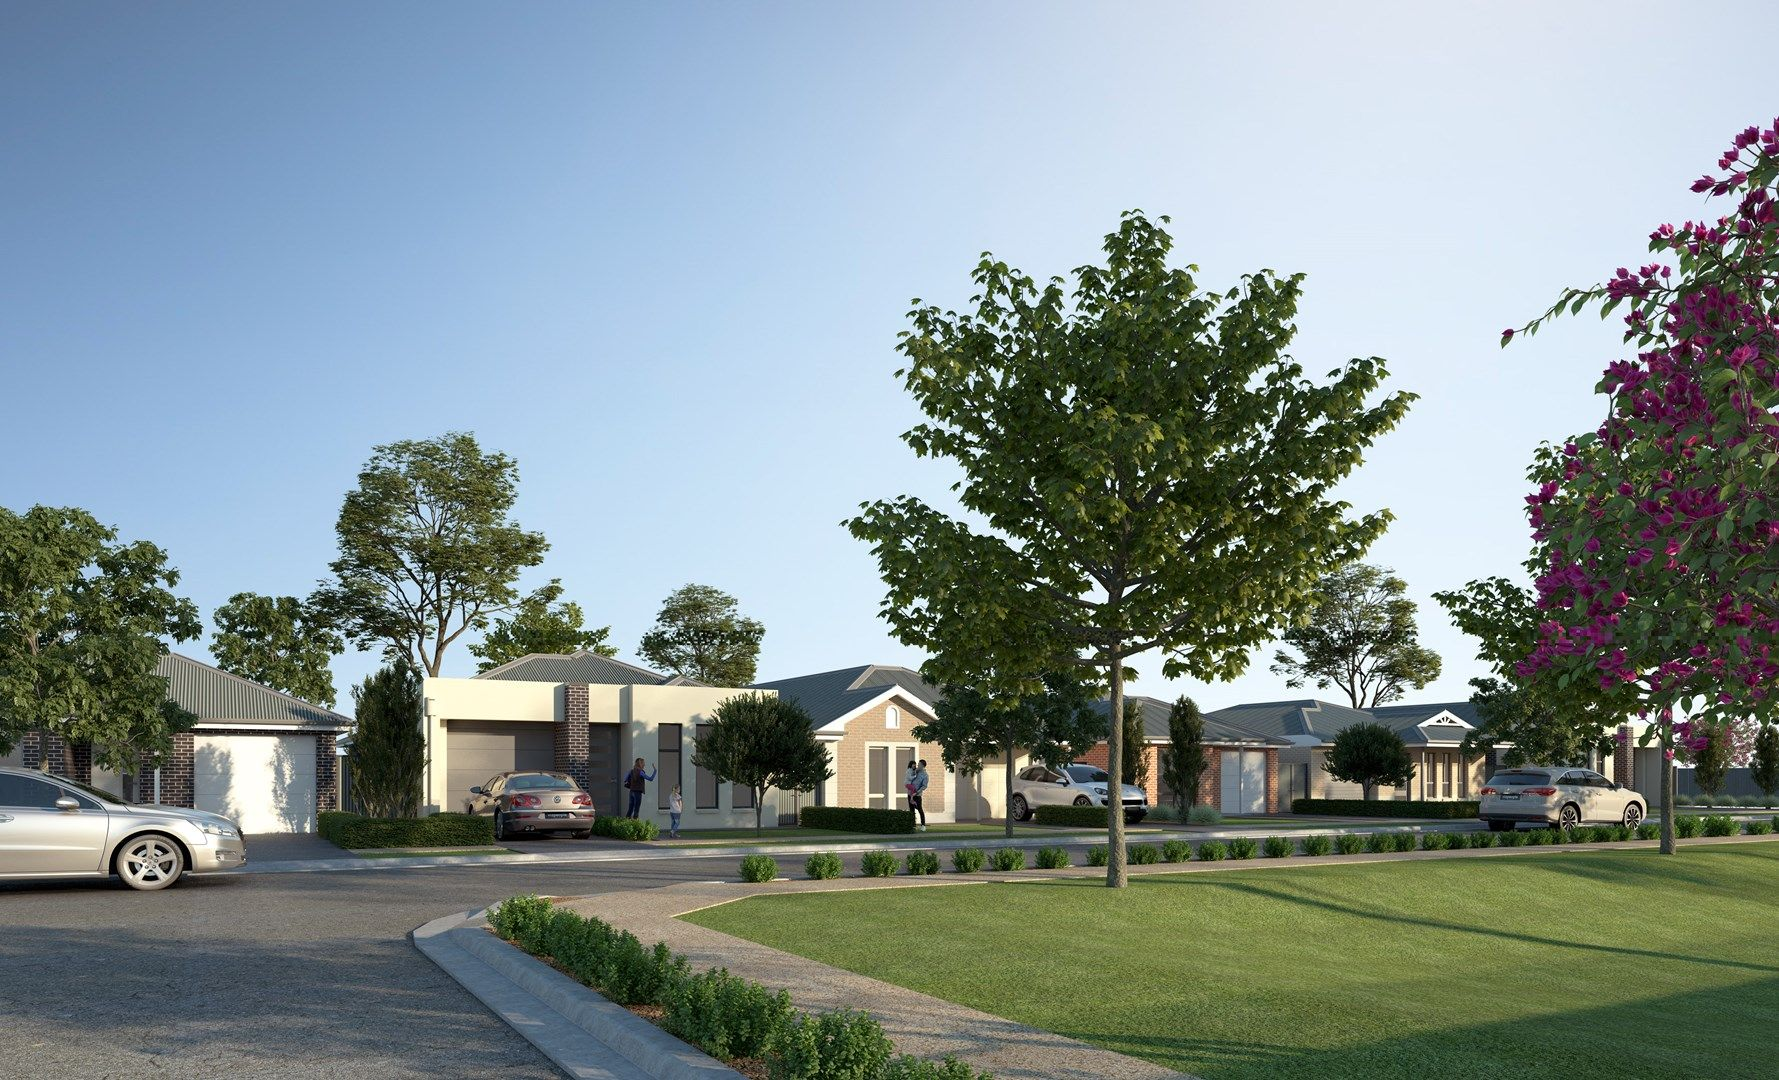 Lot 29, 1 Goodall Avenue, Croydon Park SA 5008, Image 1